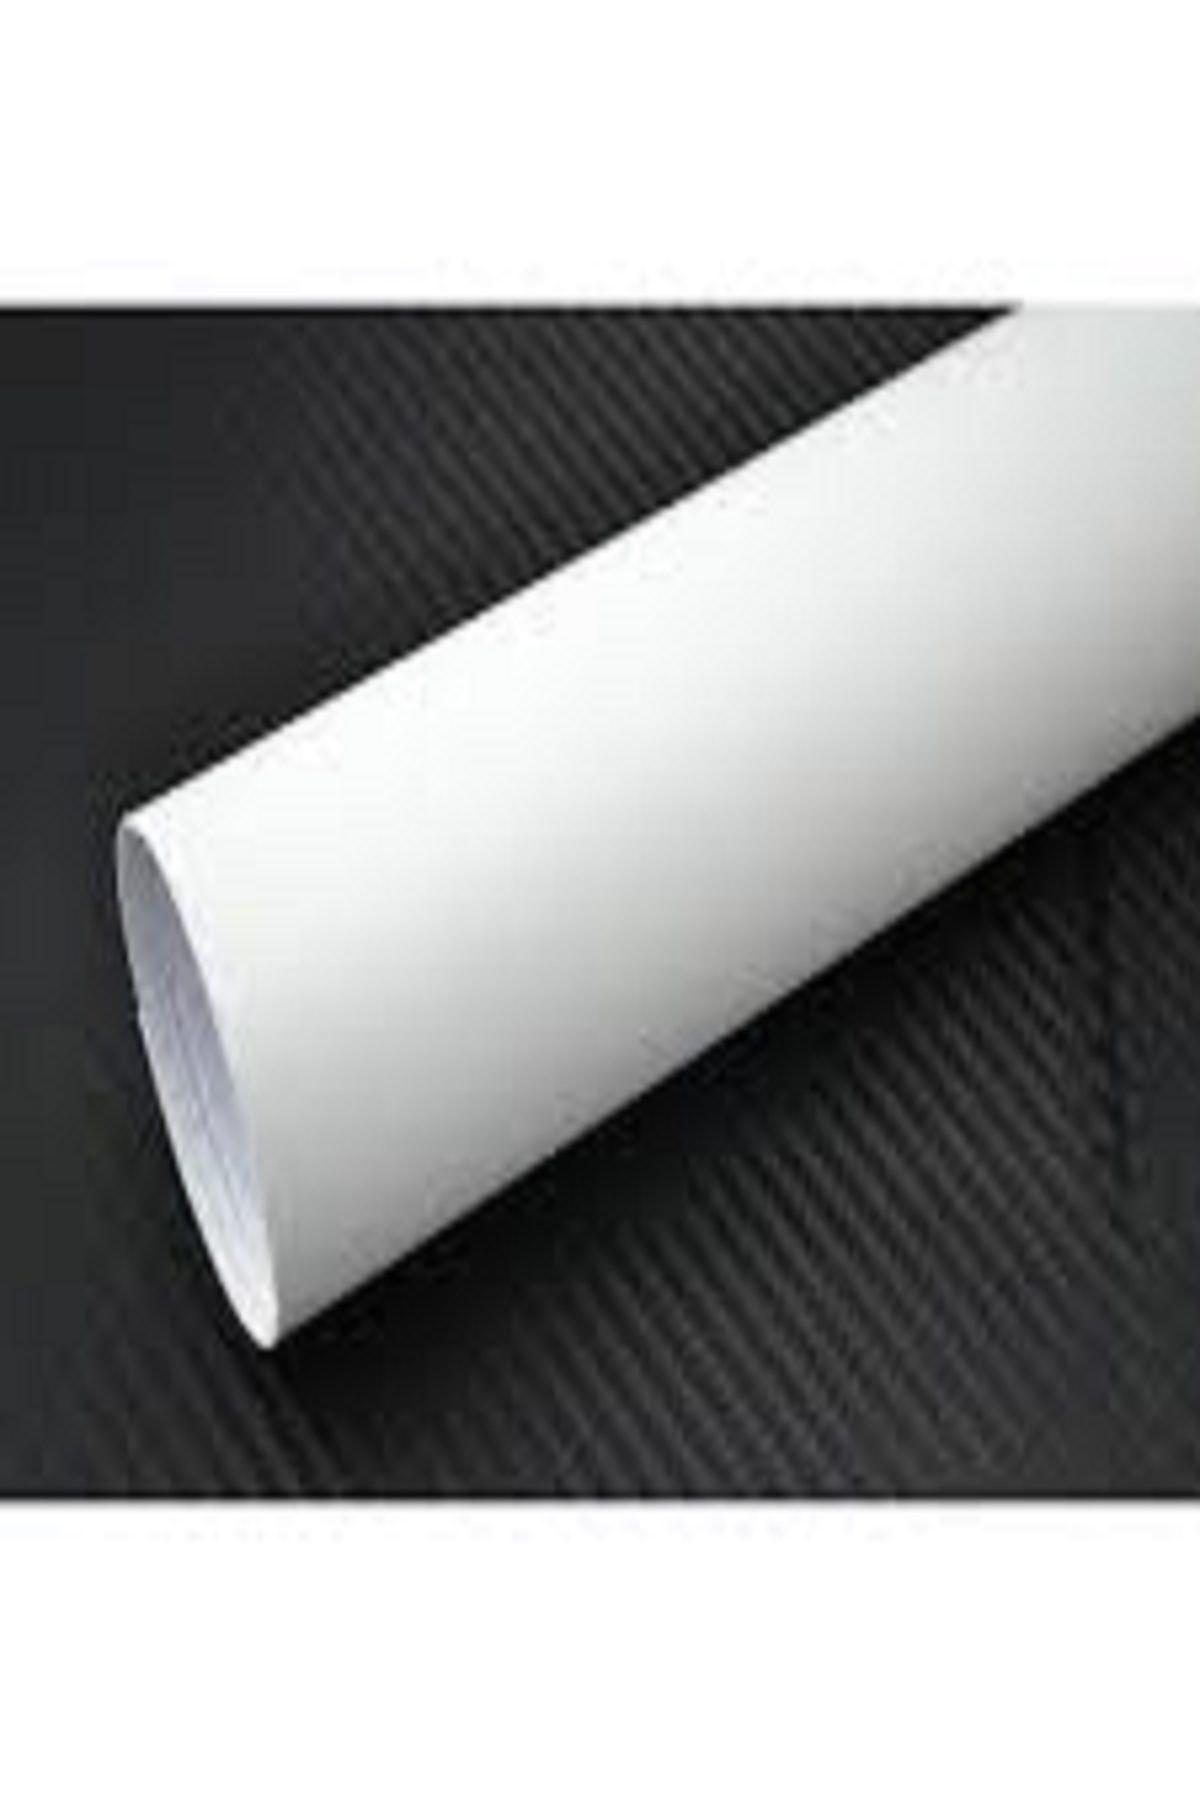 Ecce Mat  Beyaz Yapışkanlı Folyo  75 cm  X 9 mt 2